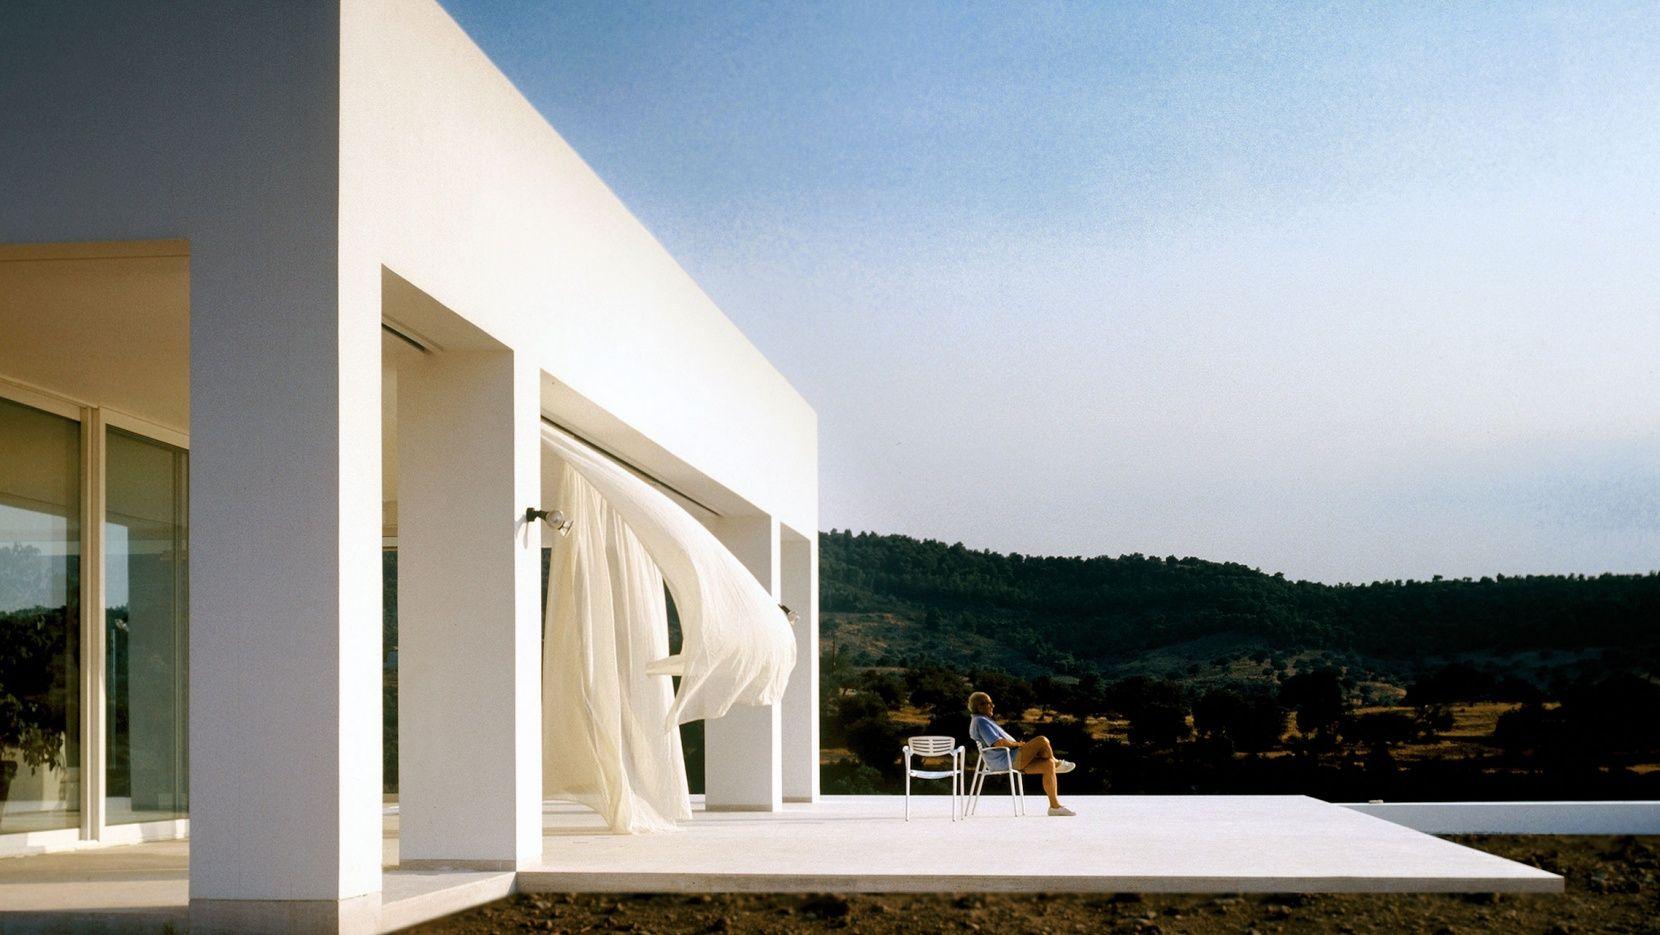 Ladrillo Definitivo acelerador  The Inspirational Designs of Greek Architect Nicos Valsamakis | Yatzer |  Architect, Architecture, Architecture photography buildings